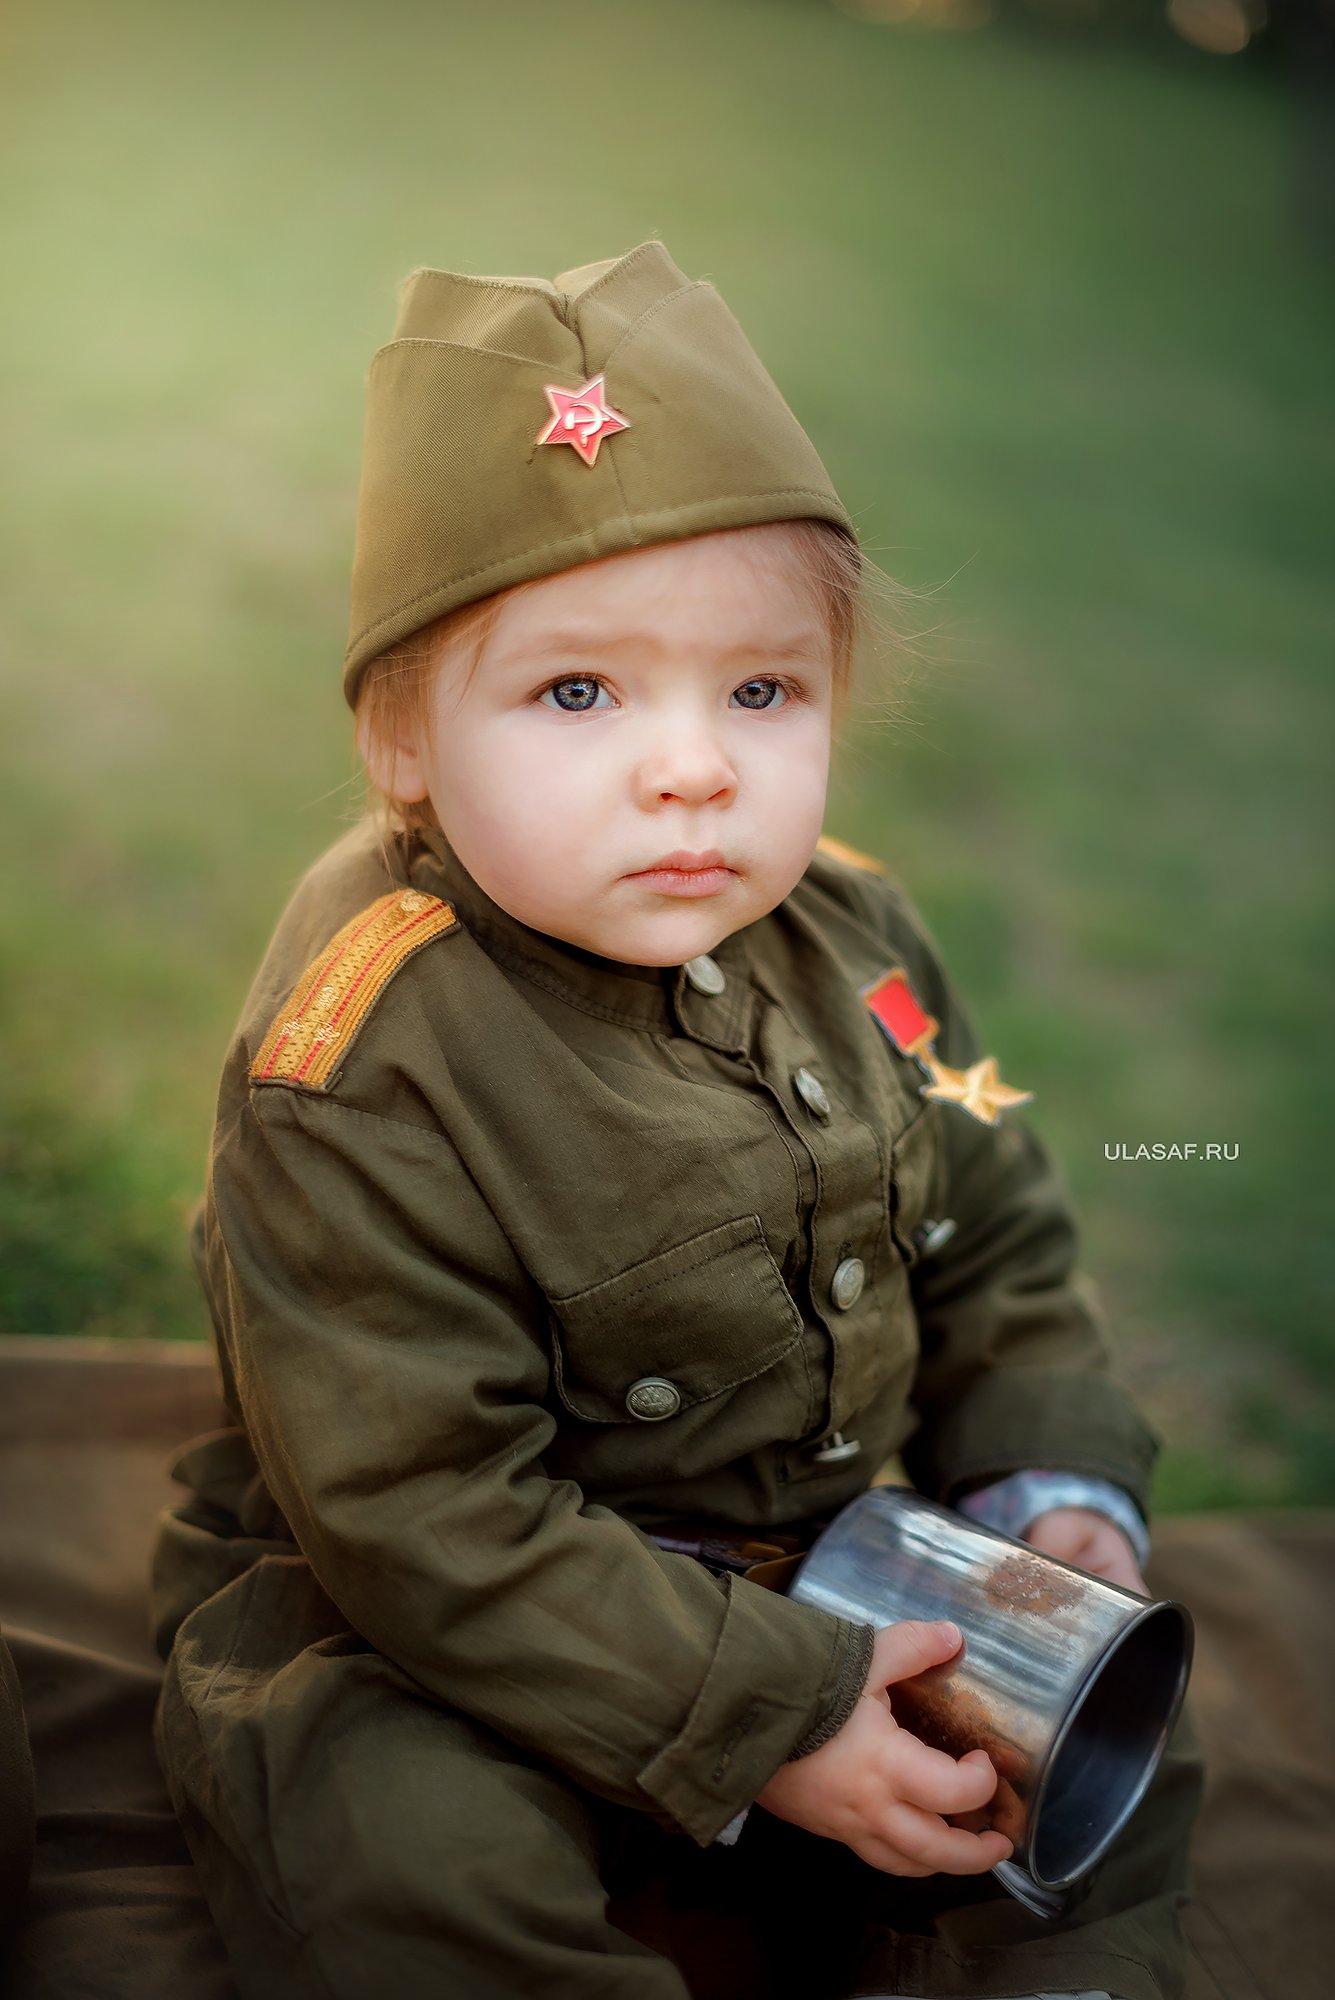 girl, portrait, девочка, портрет, война, 9мая, солдат, кружка, Юлия Сафонова